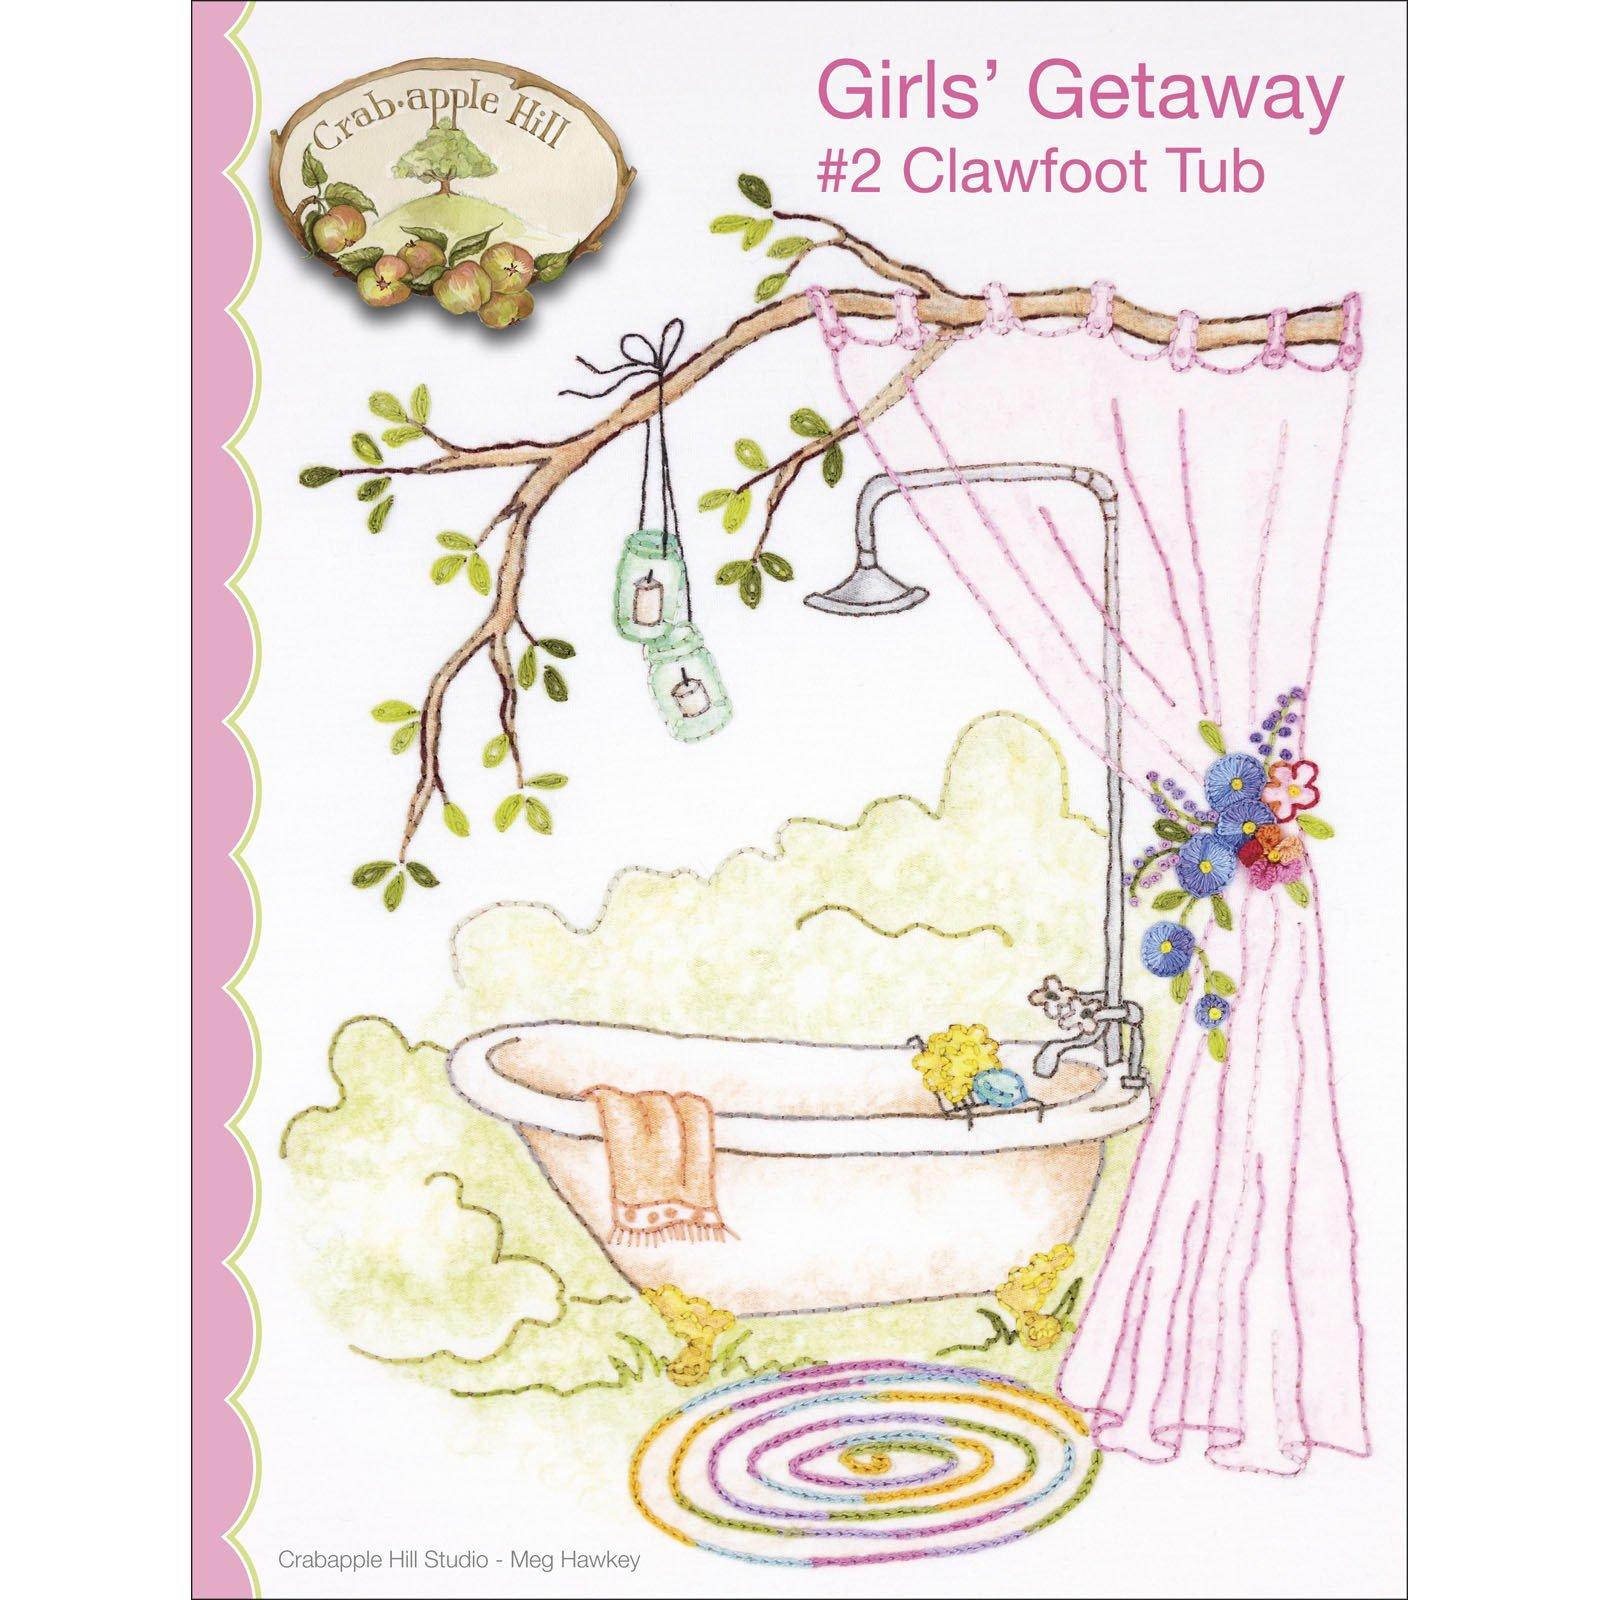 Girls Getaway 2 Clawfoot Tub